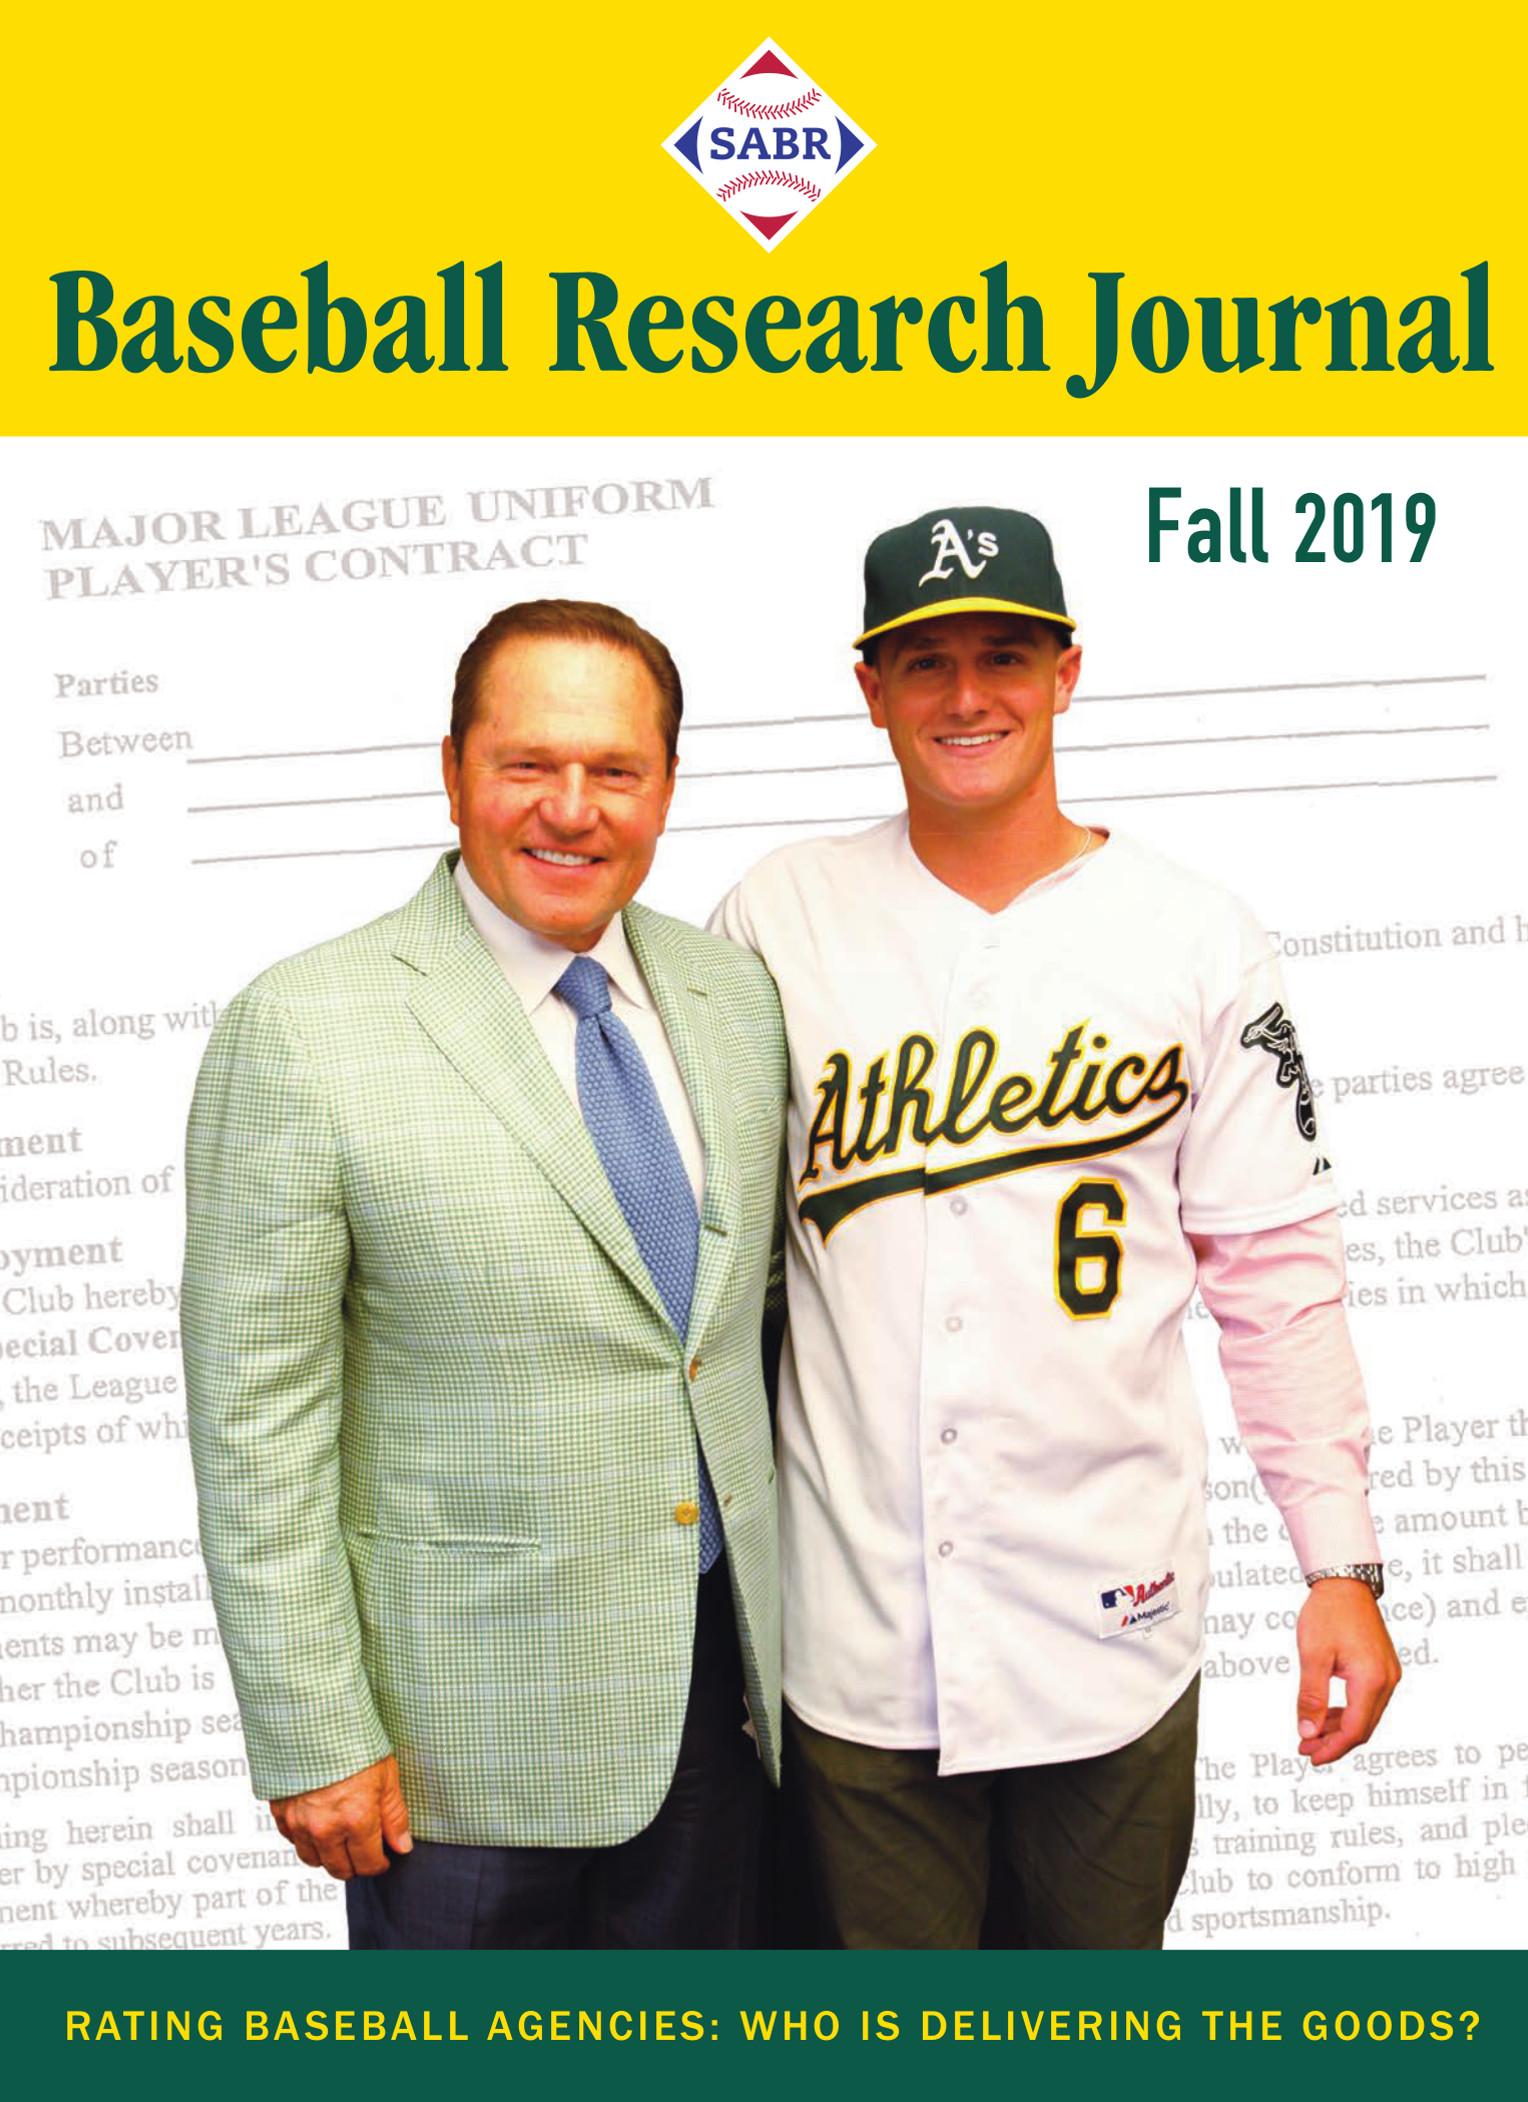 Fall 2019 Baseball Research Journal